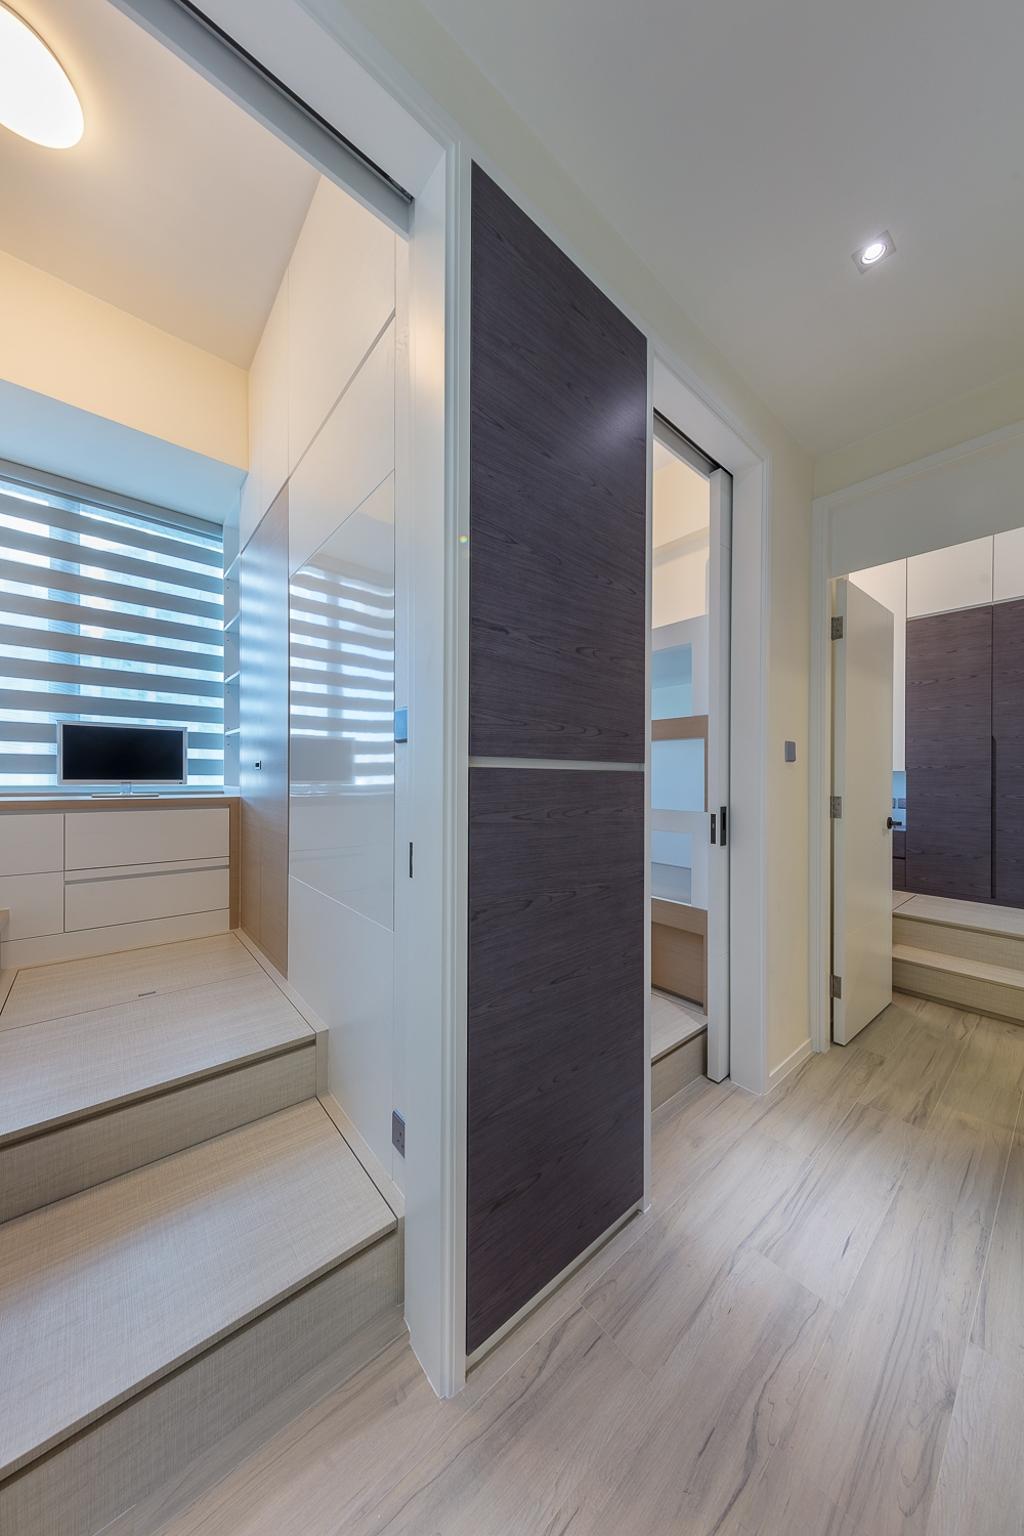 摩登, 私家樓, 一號銀海, 室內設計師, 和生設計, Door, Sliding Door, 浴室, Indoors, Interior Design, Room